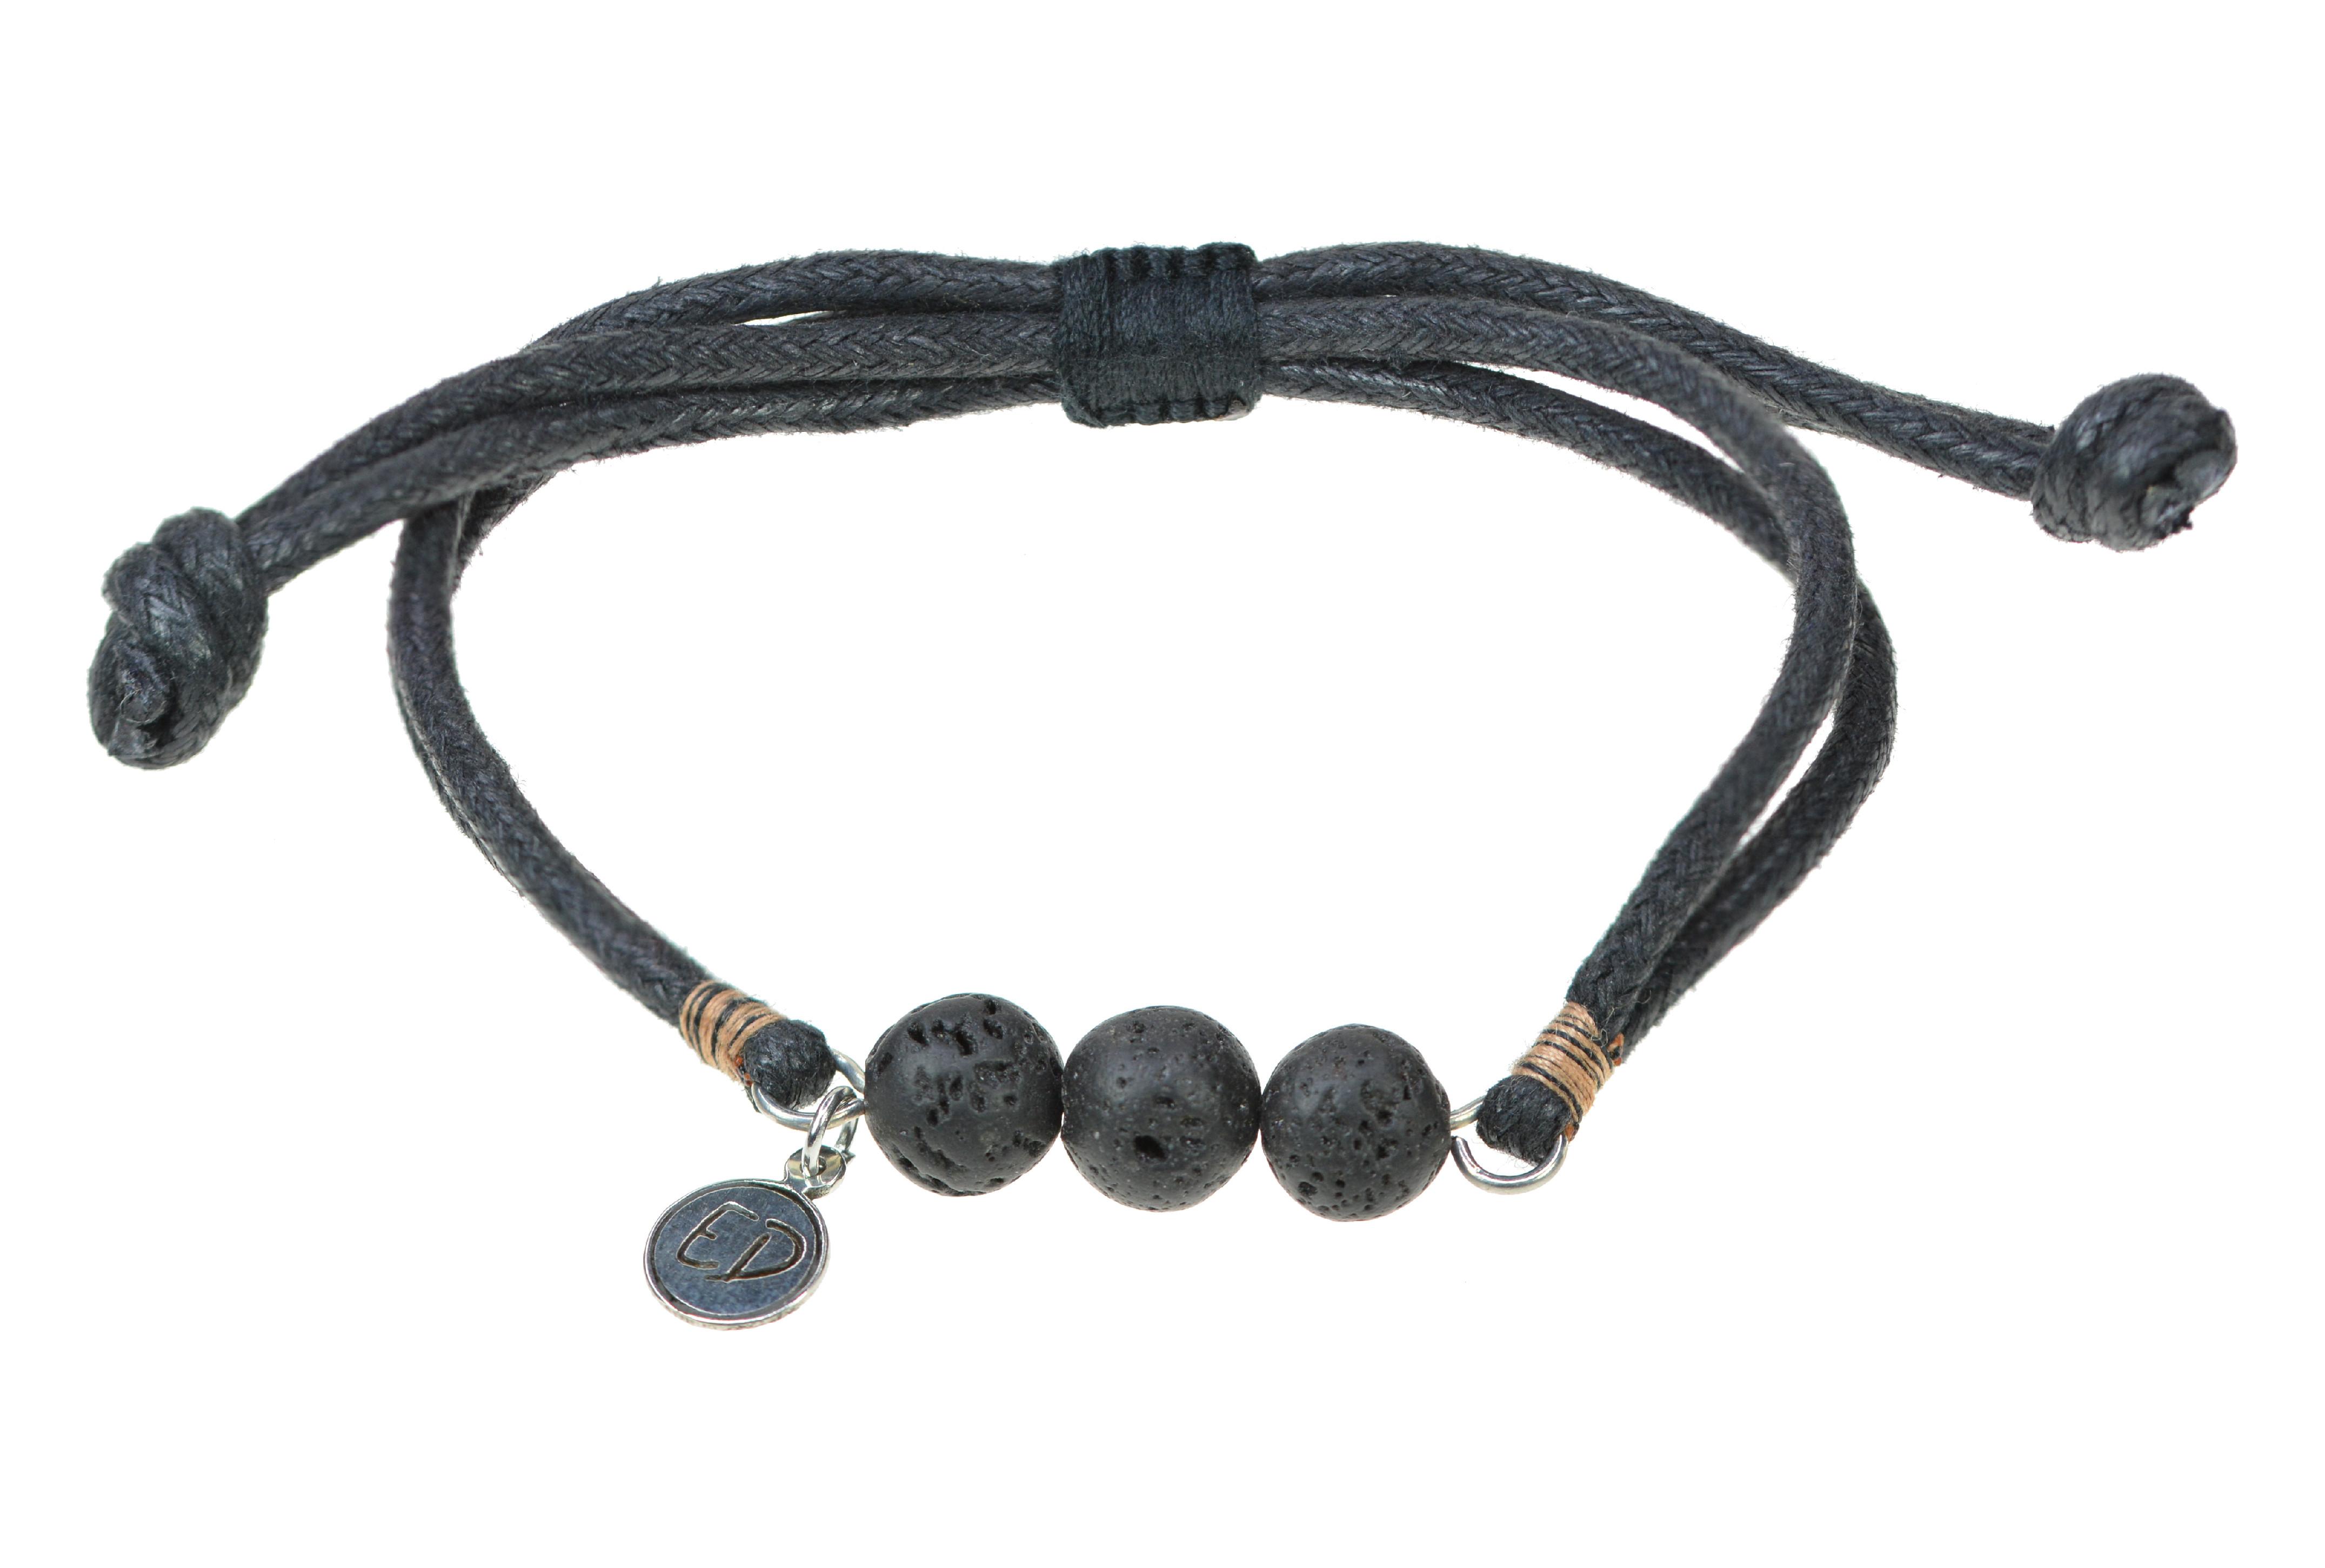 Pánsky náramok s lávovými kameňmi a hnedou bavlnenou nitkou